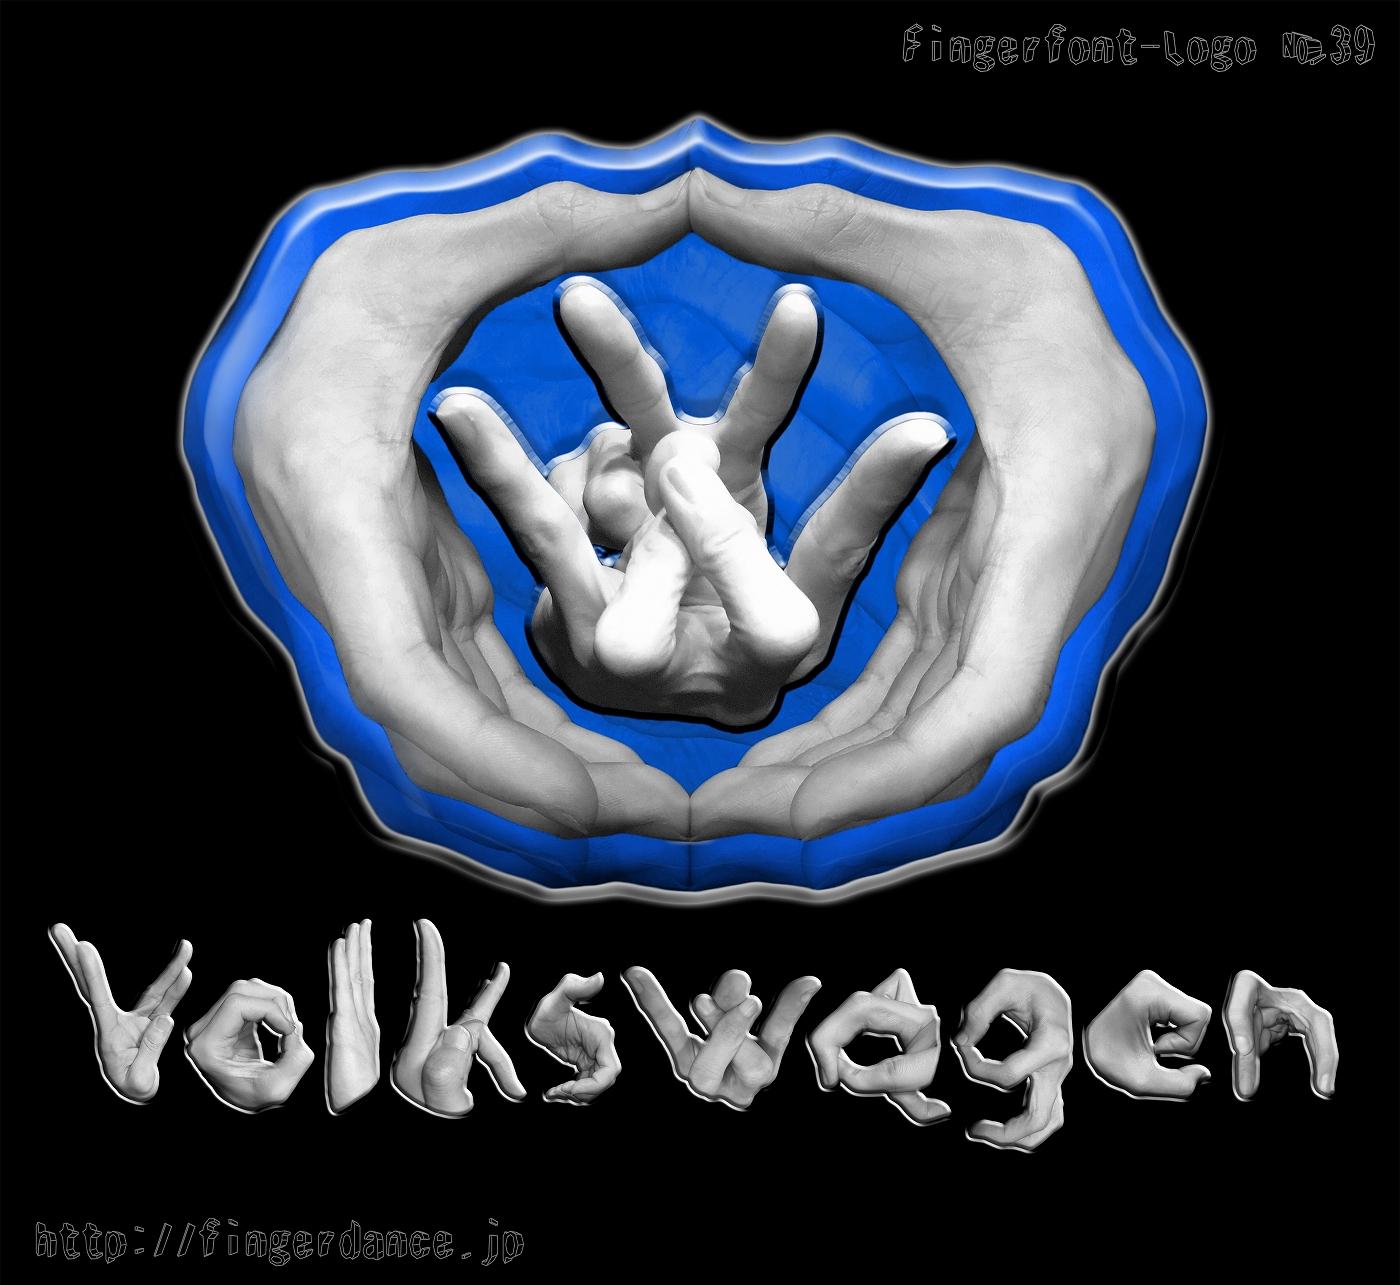 VolksWagen-fingerhttp://fingerdance.jp/L/logohand フォルクスワーゲンフィンガーロゴハンド手指